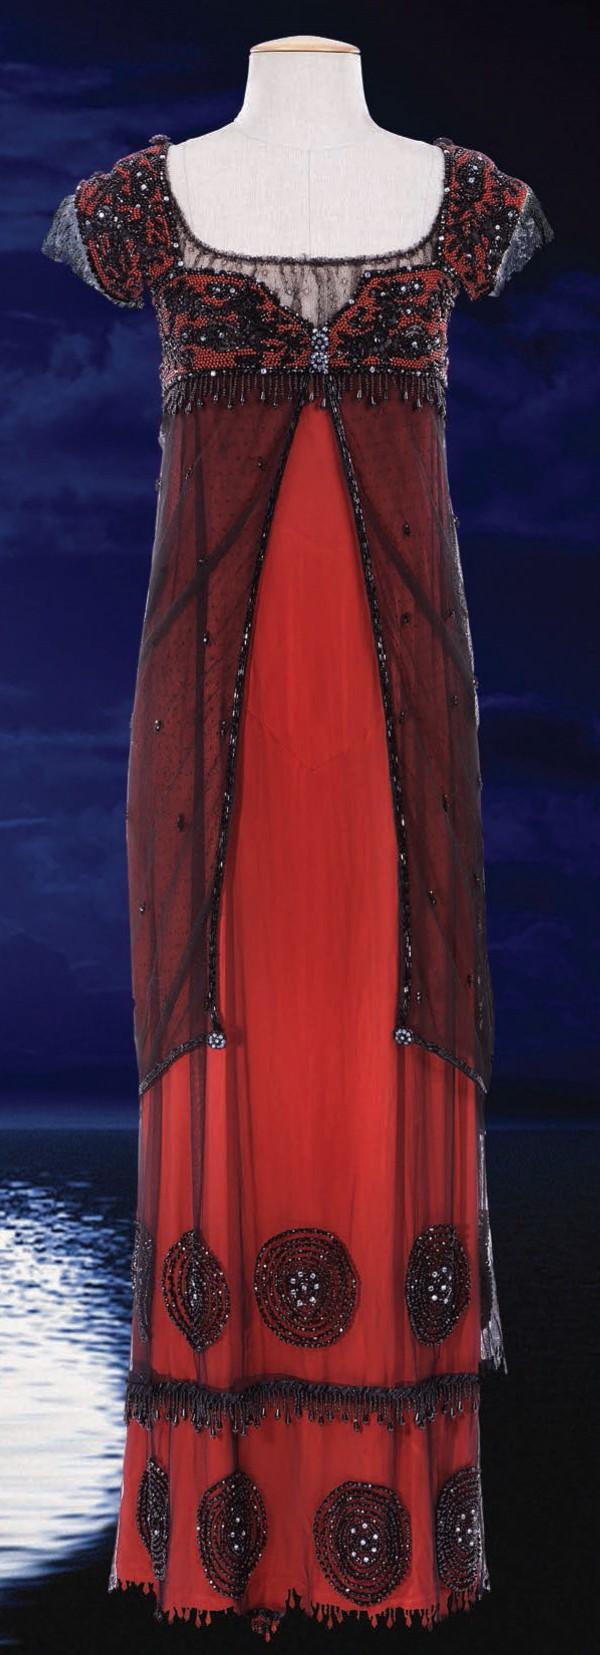 Kate Winslet's Titanic...